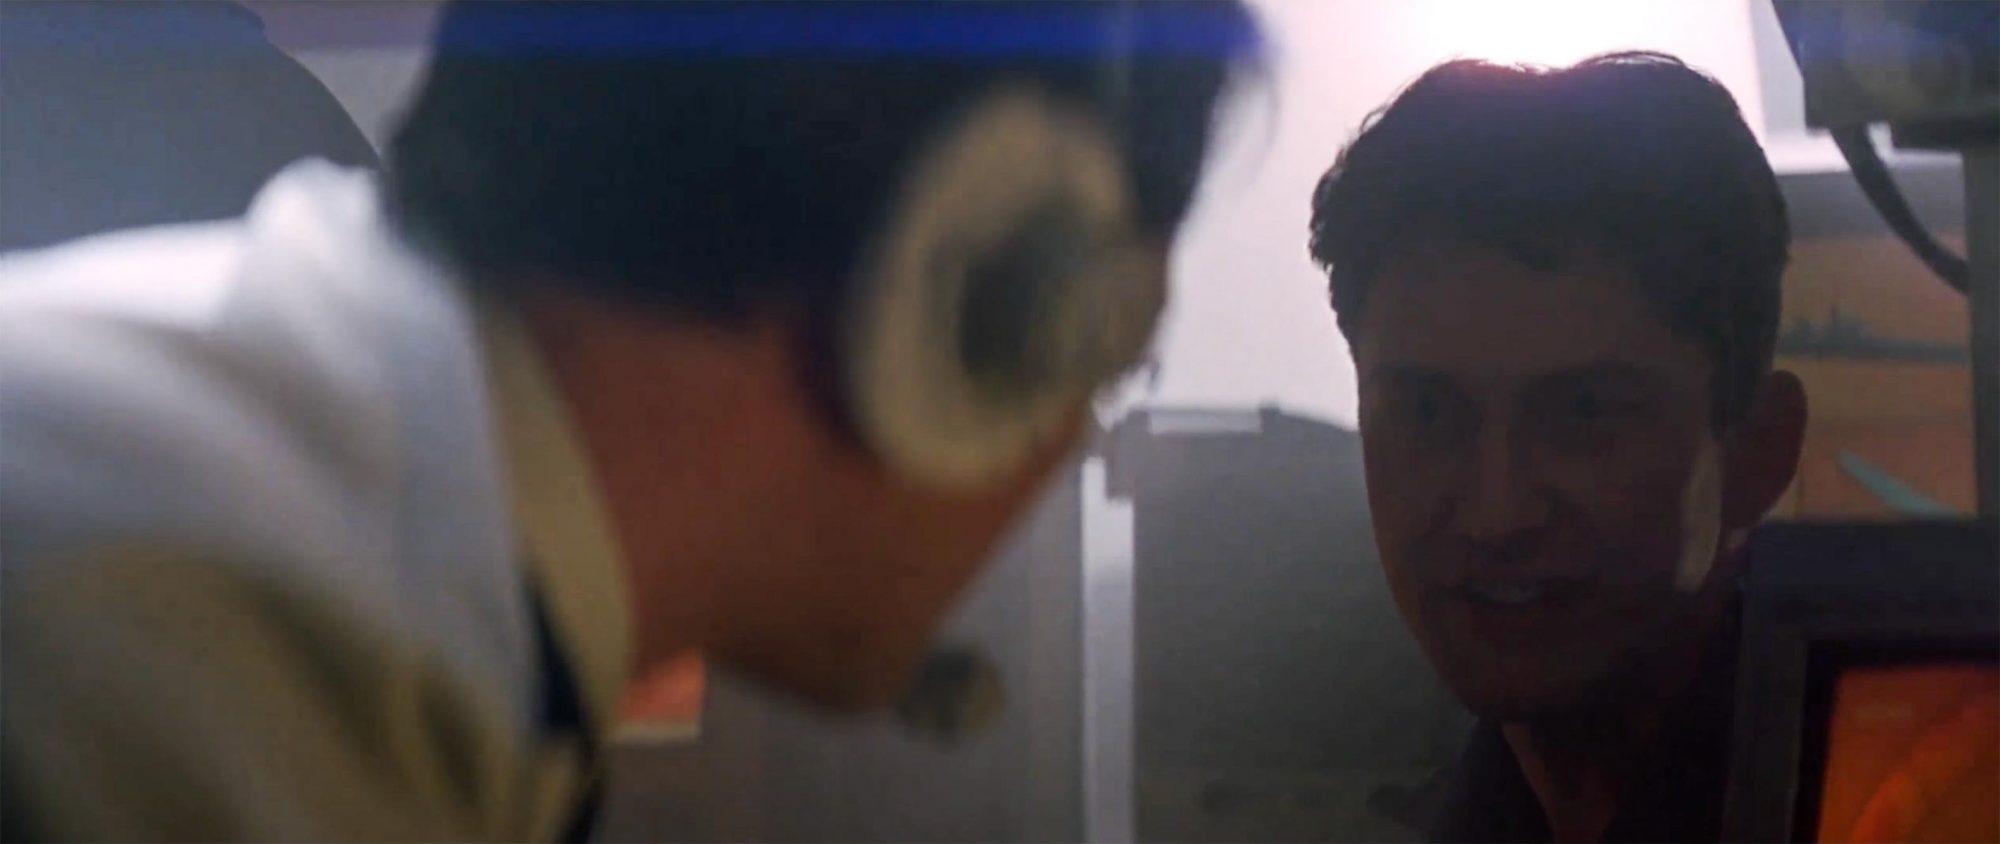 Bond Cameos Gerard Butler in Tomorrow Never Dies